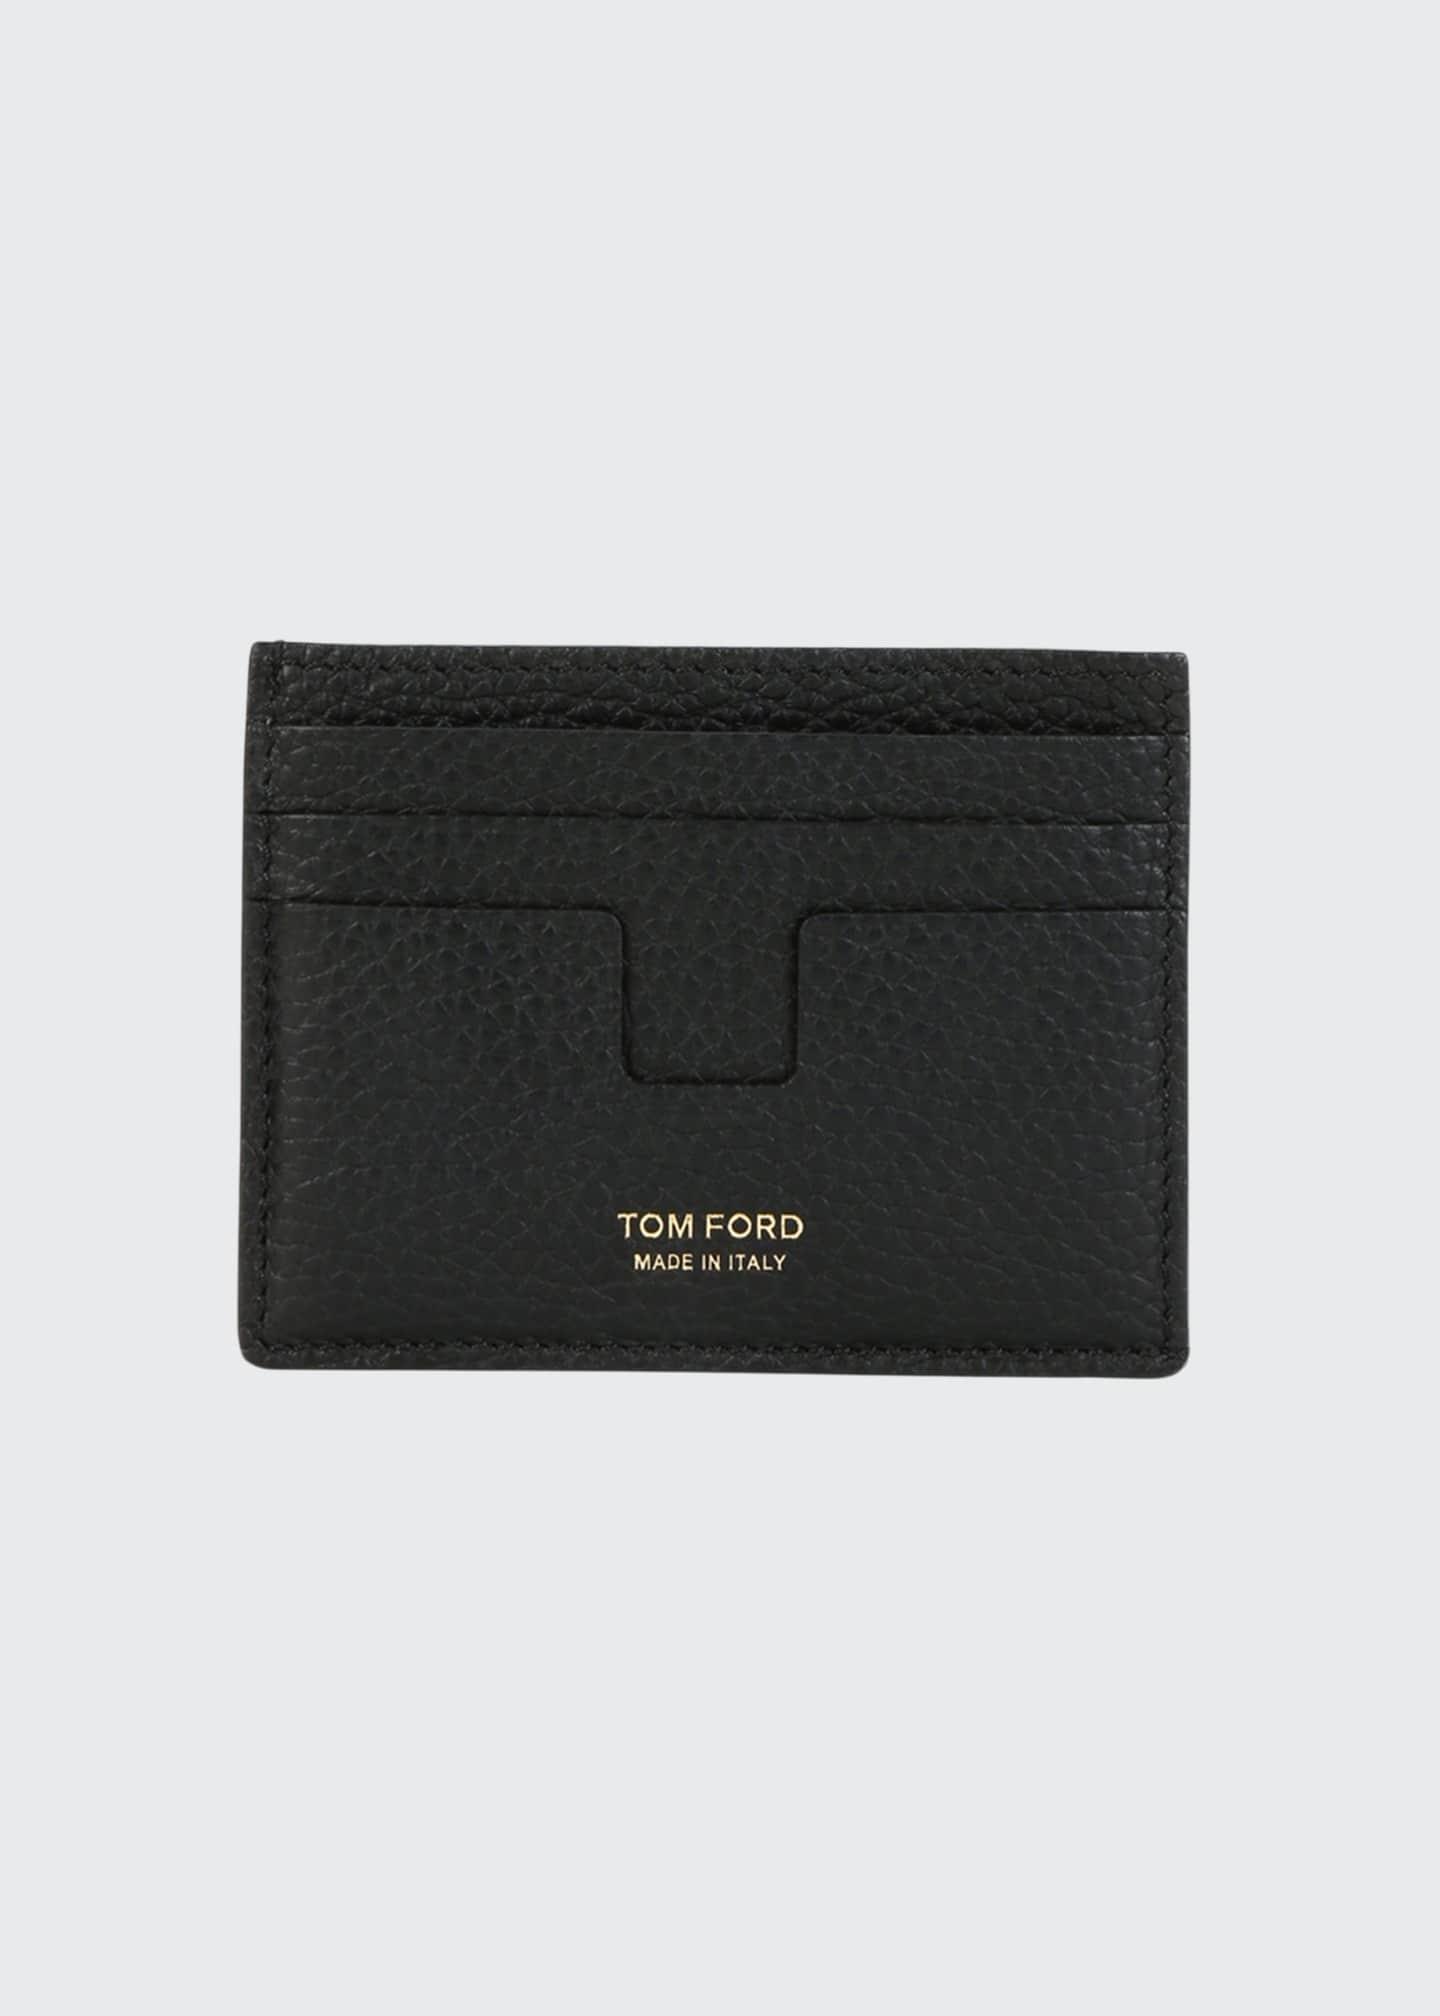 TOM FORD Men's Leather Card Holder